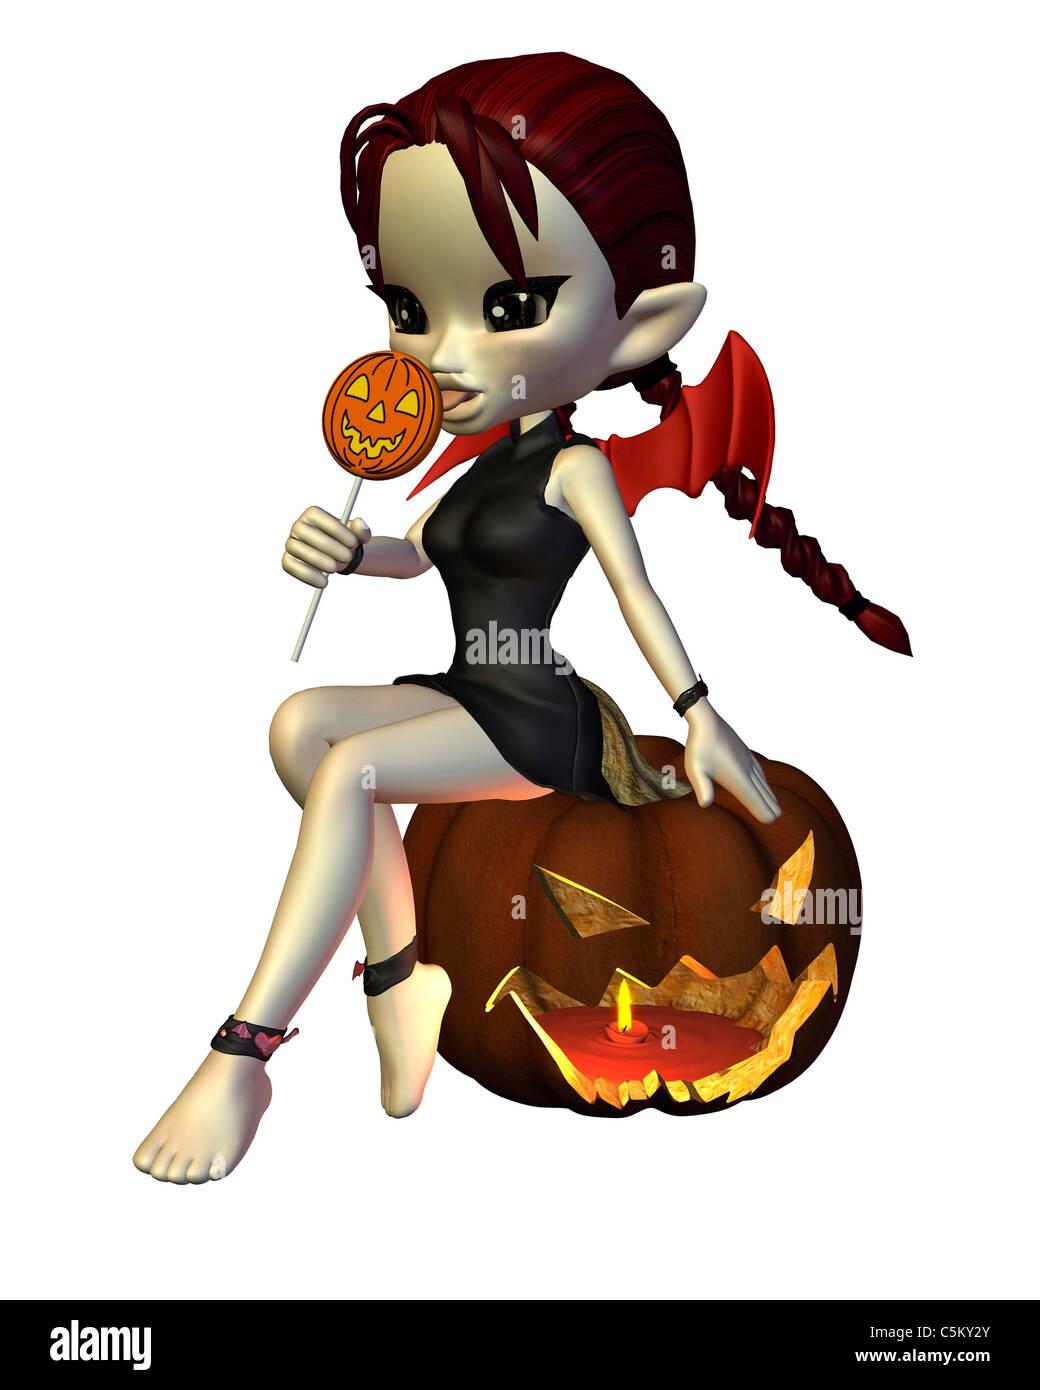 Cute Toon Halloween Devil with Lollipop and Pumpkin - Stock Image